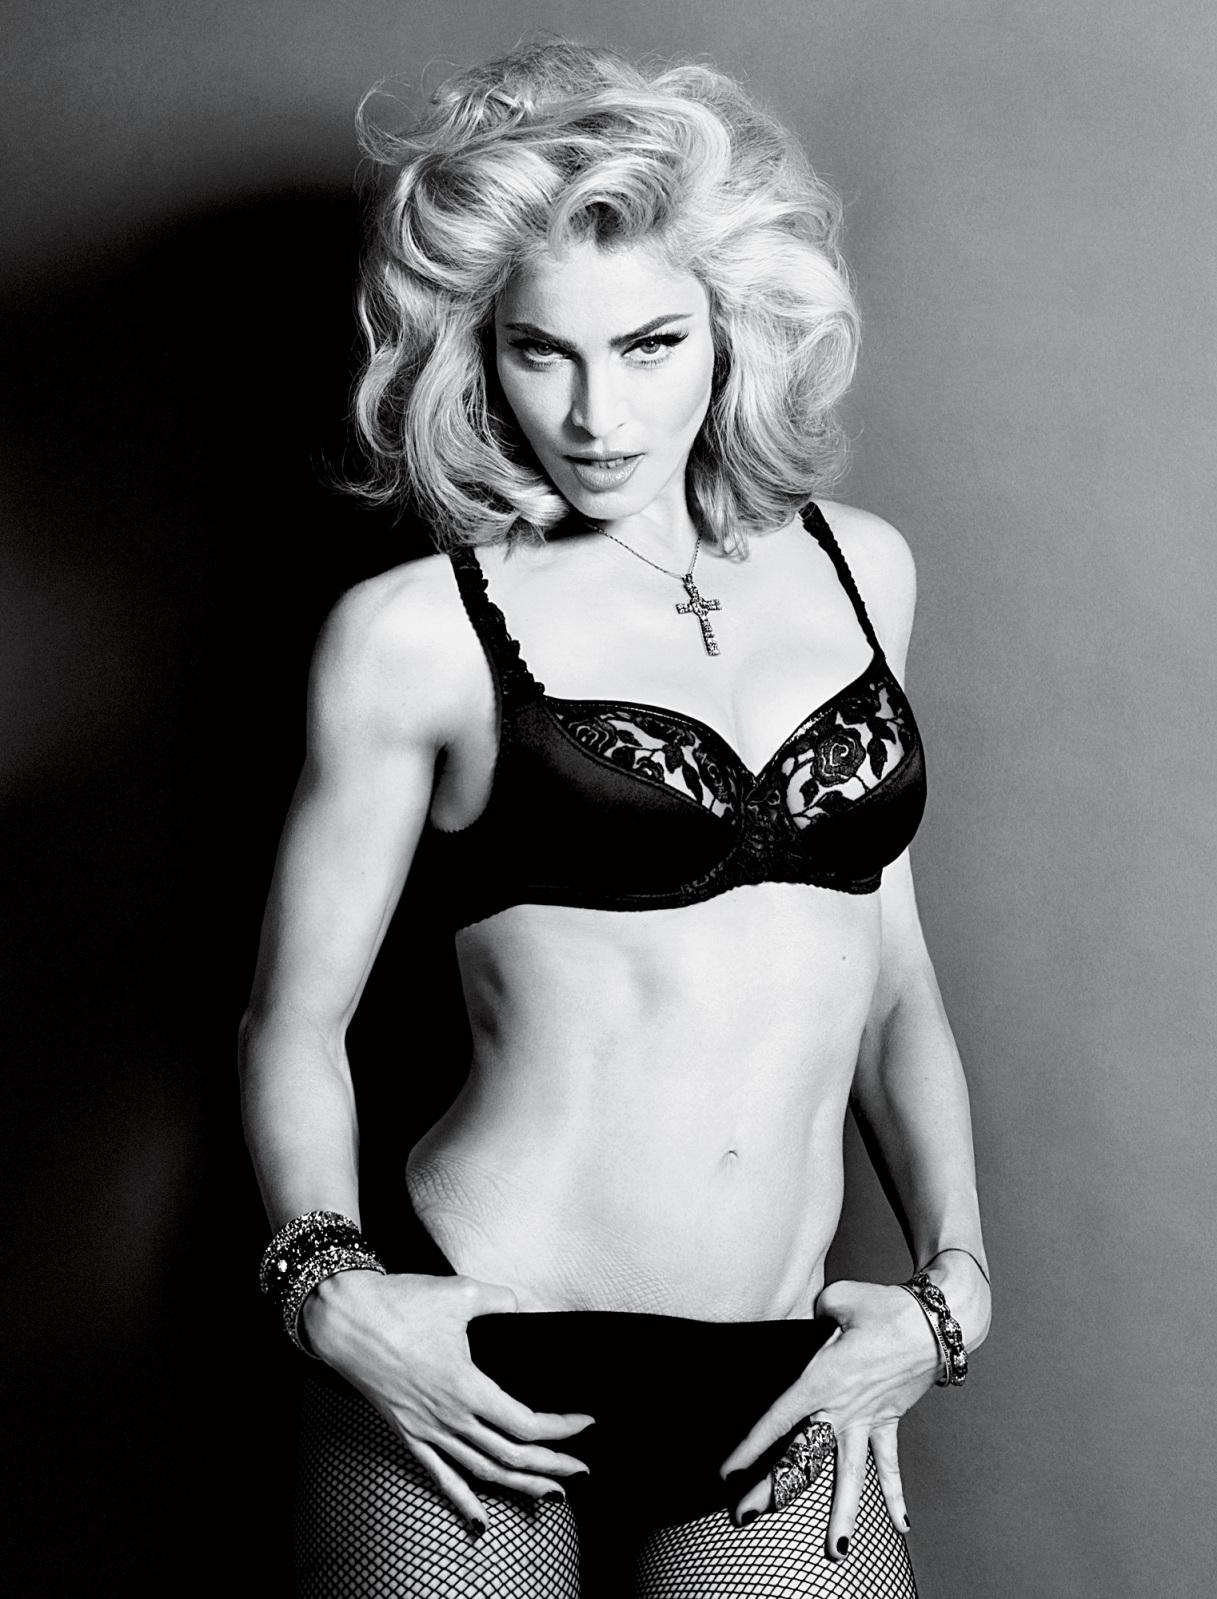 http://1.bp.blogspot.com/_IvkbVmqjYtc/TGlntay5X9I/AAAAAAAAAk0/kO5J9IOnPQI/s1600/MadonnaInterviewMagazine2.jpg